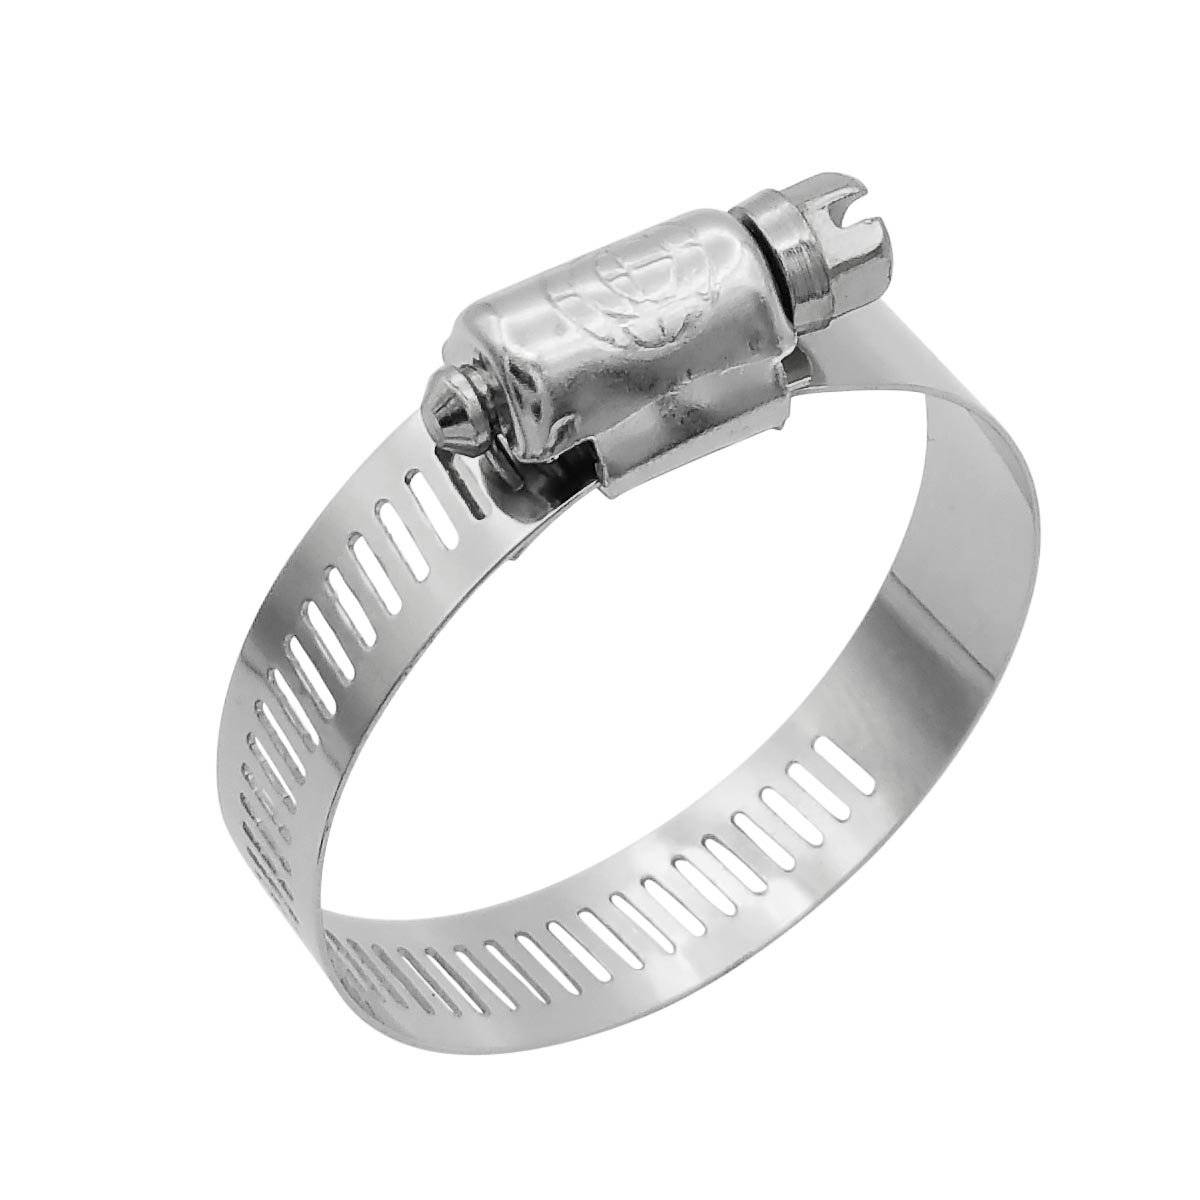 Box of 10 Minimum Diameter 2-1//16 Cambridge SAE Size 40 Worm Gear Hose Clamp ALL Stainless Steel Maximum Diameter 3 1//2 Band Width